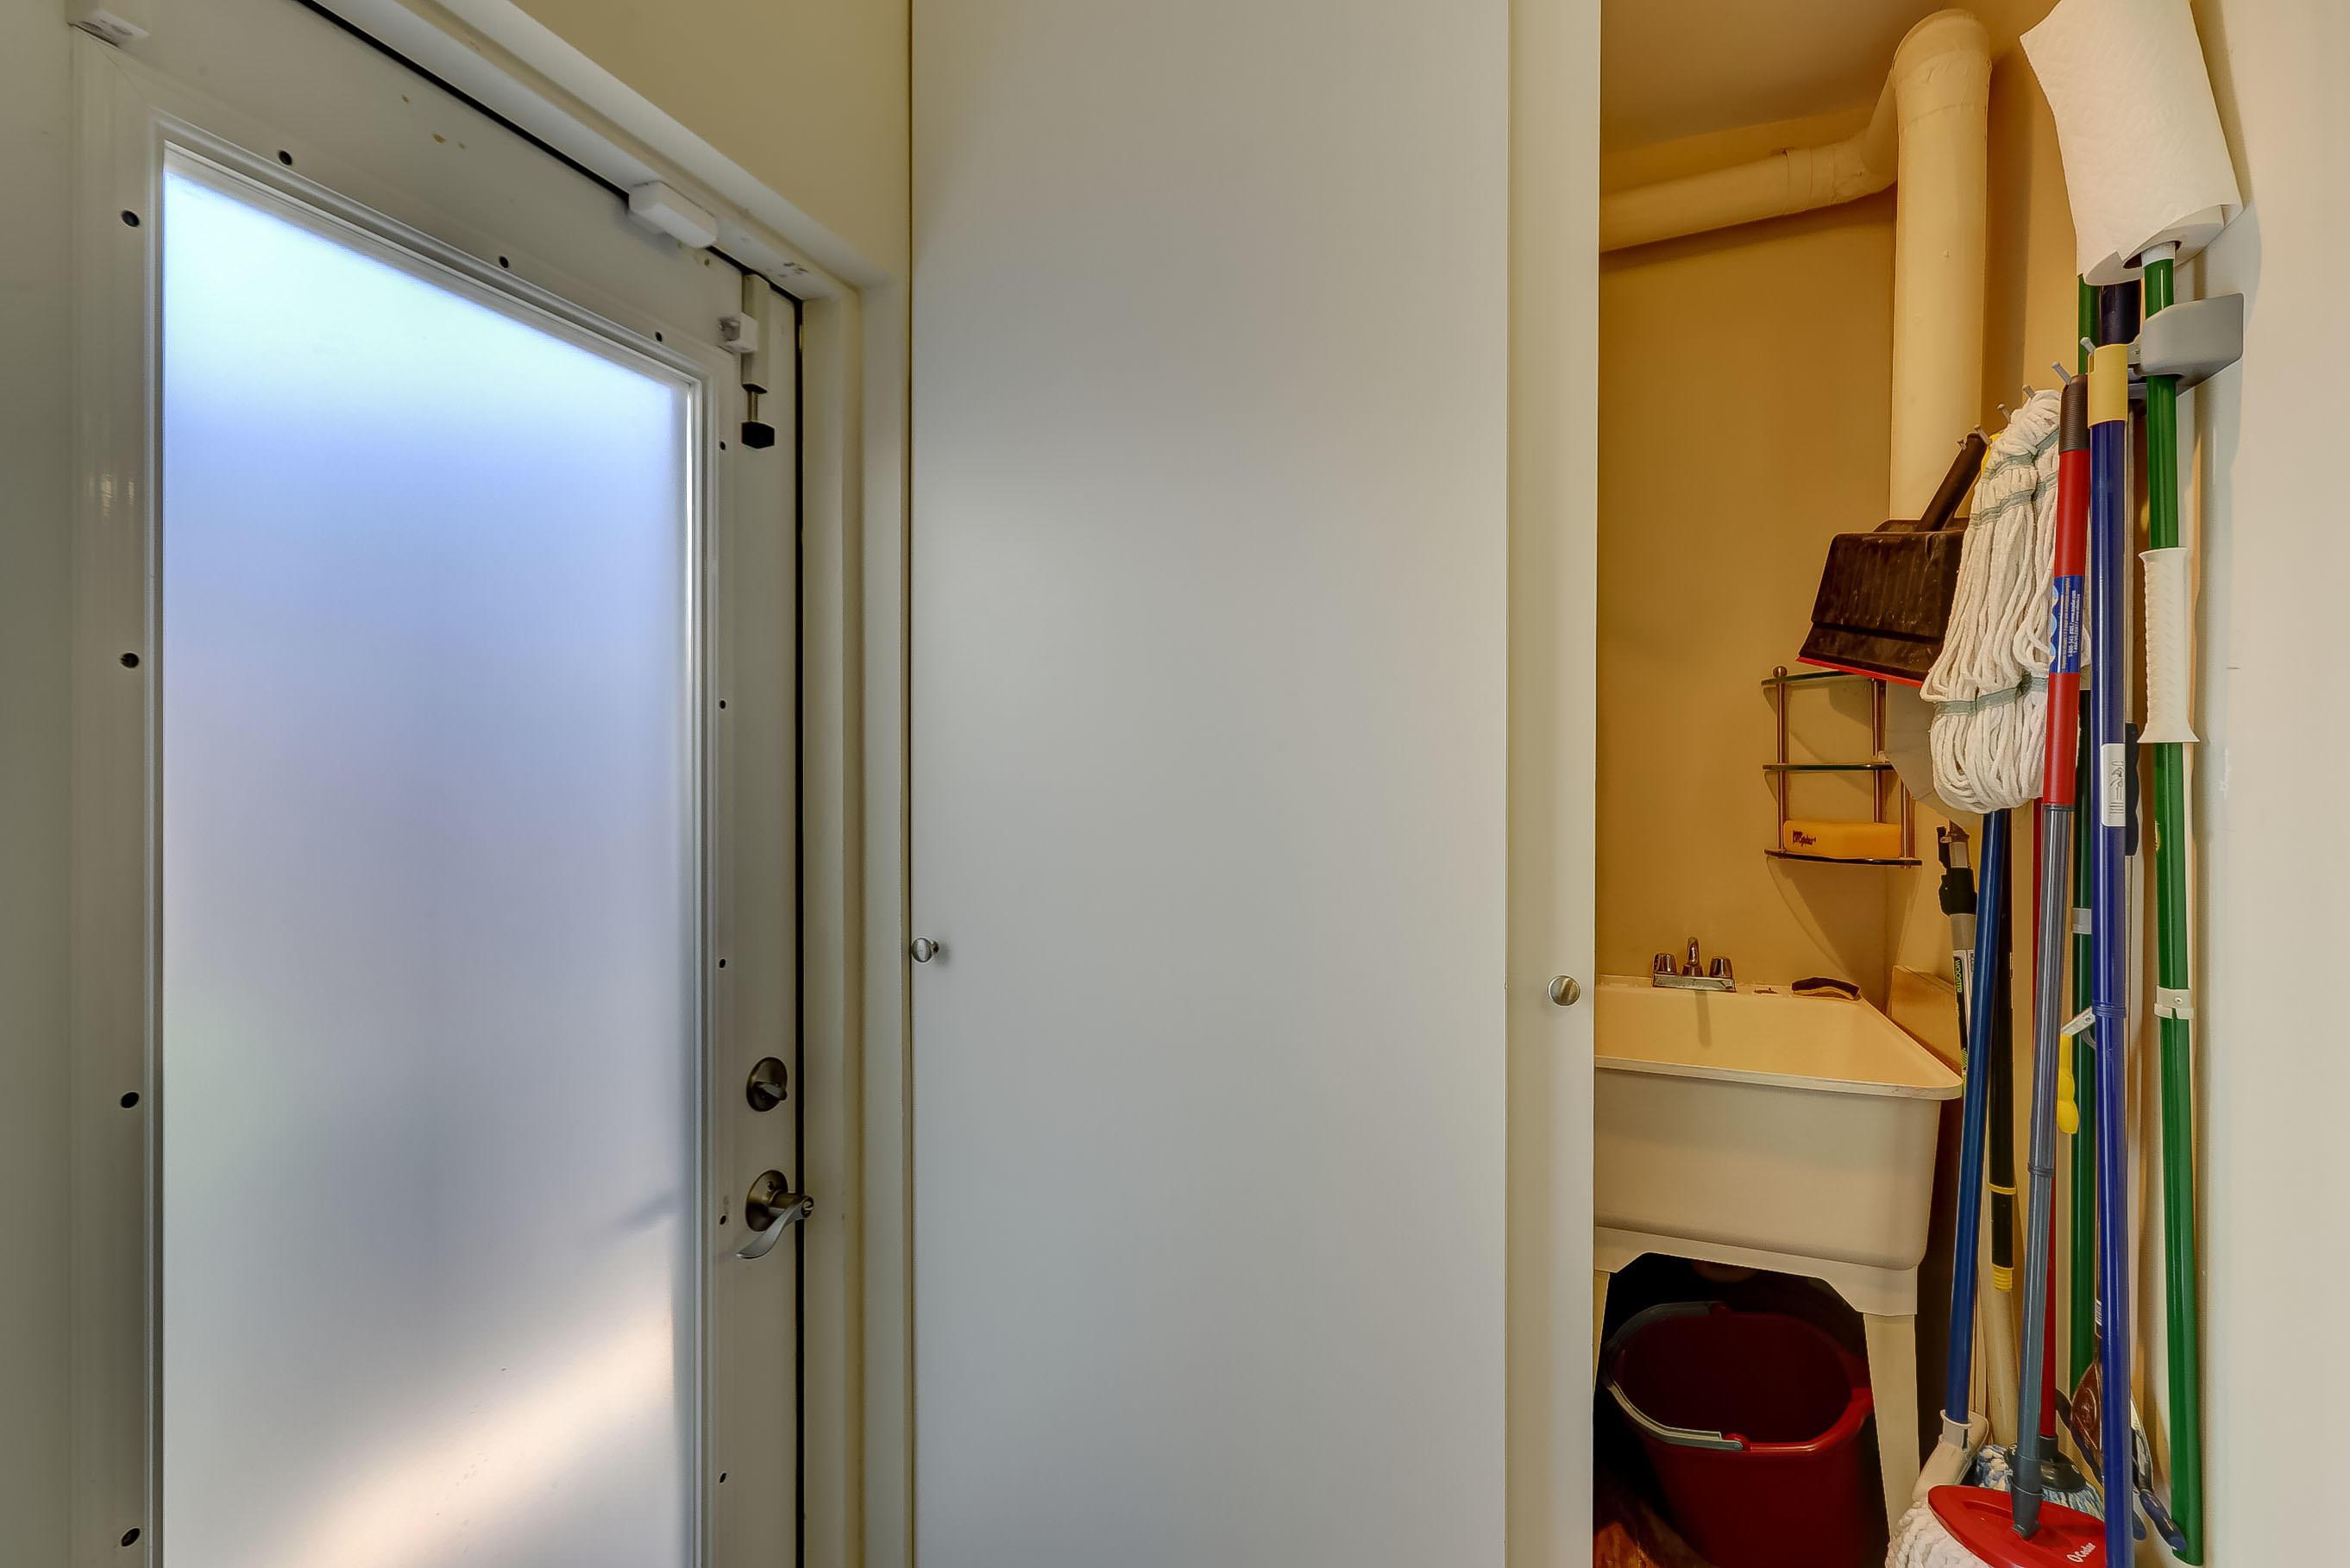 and a Utility Closet